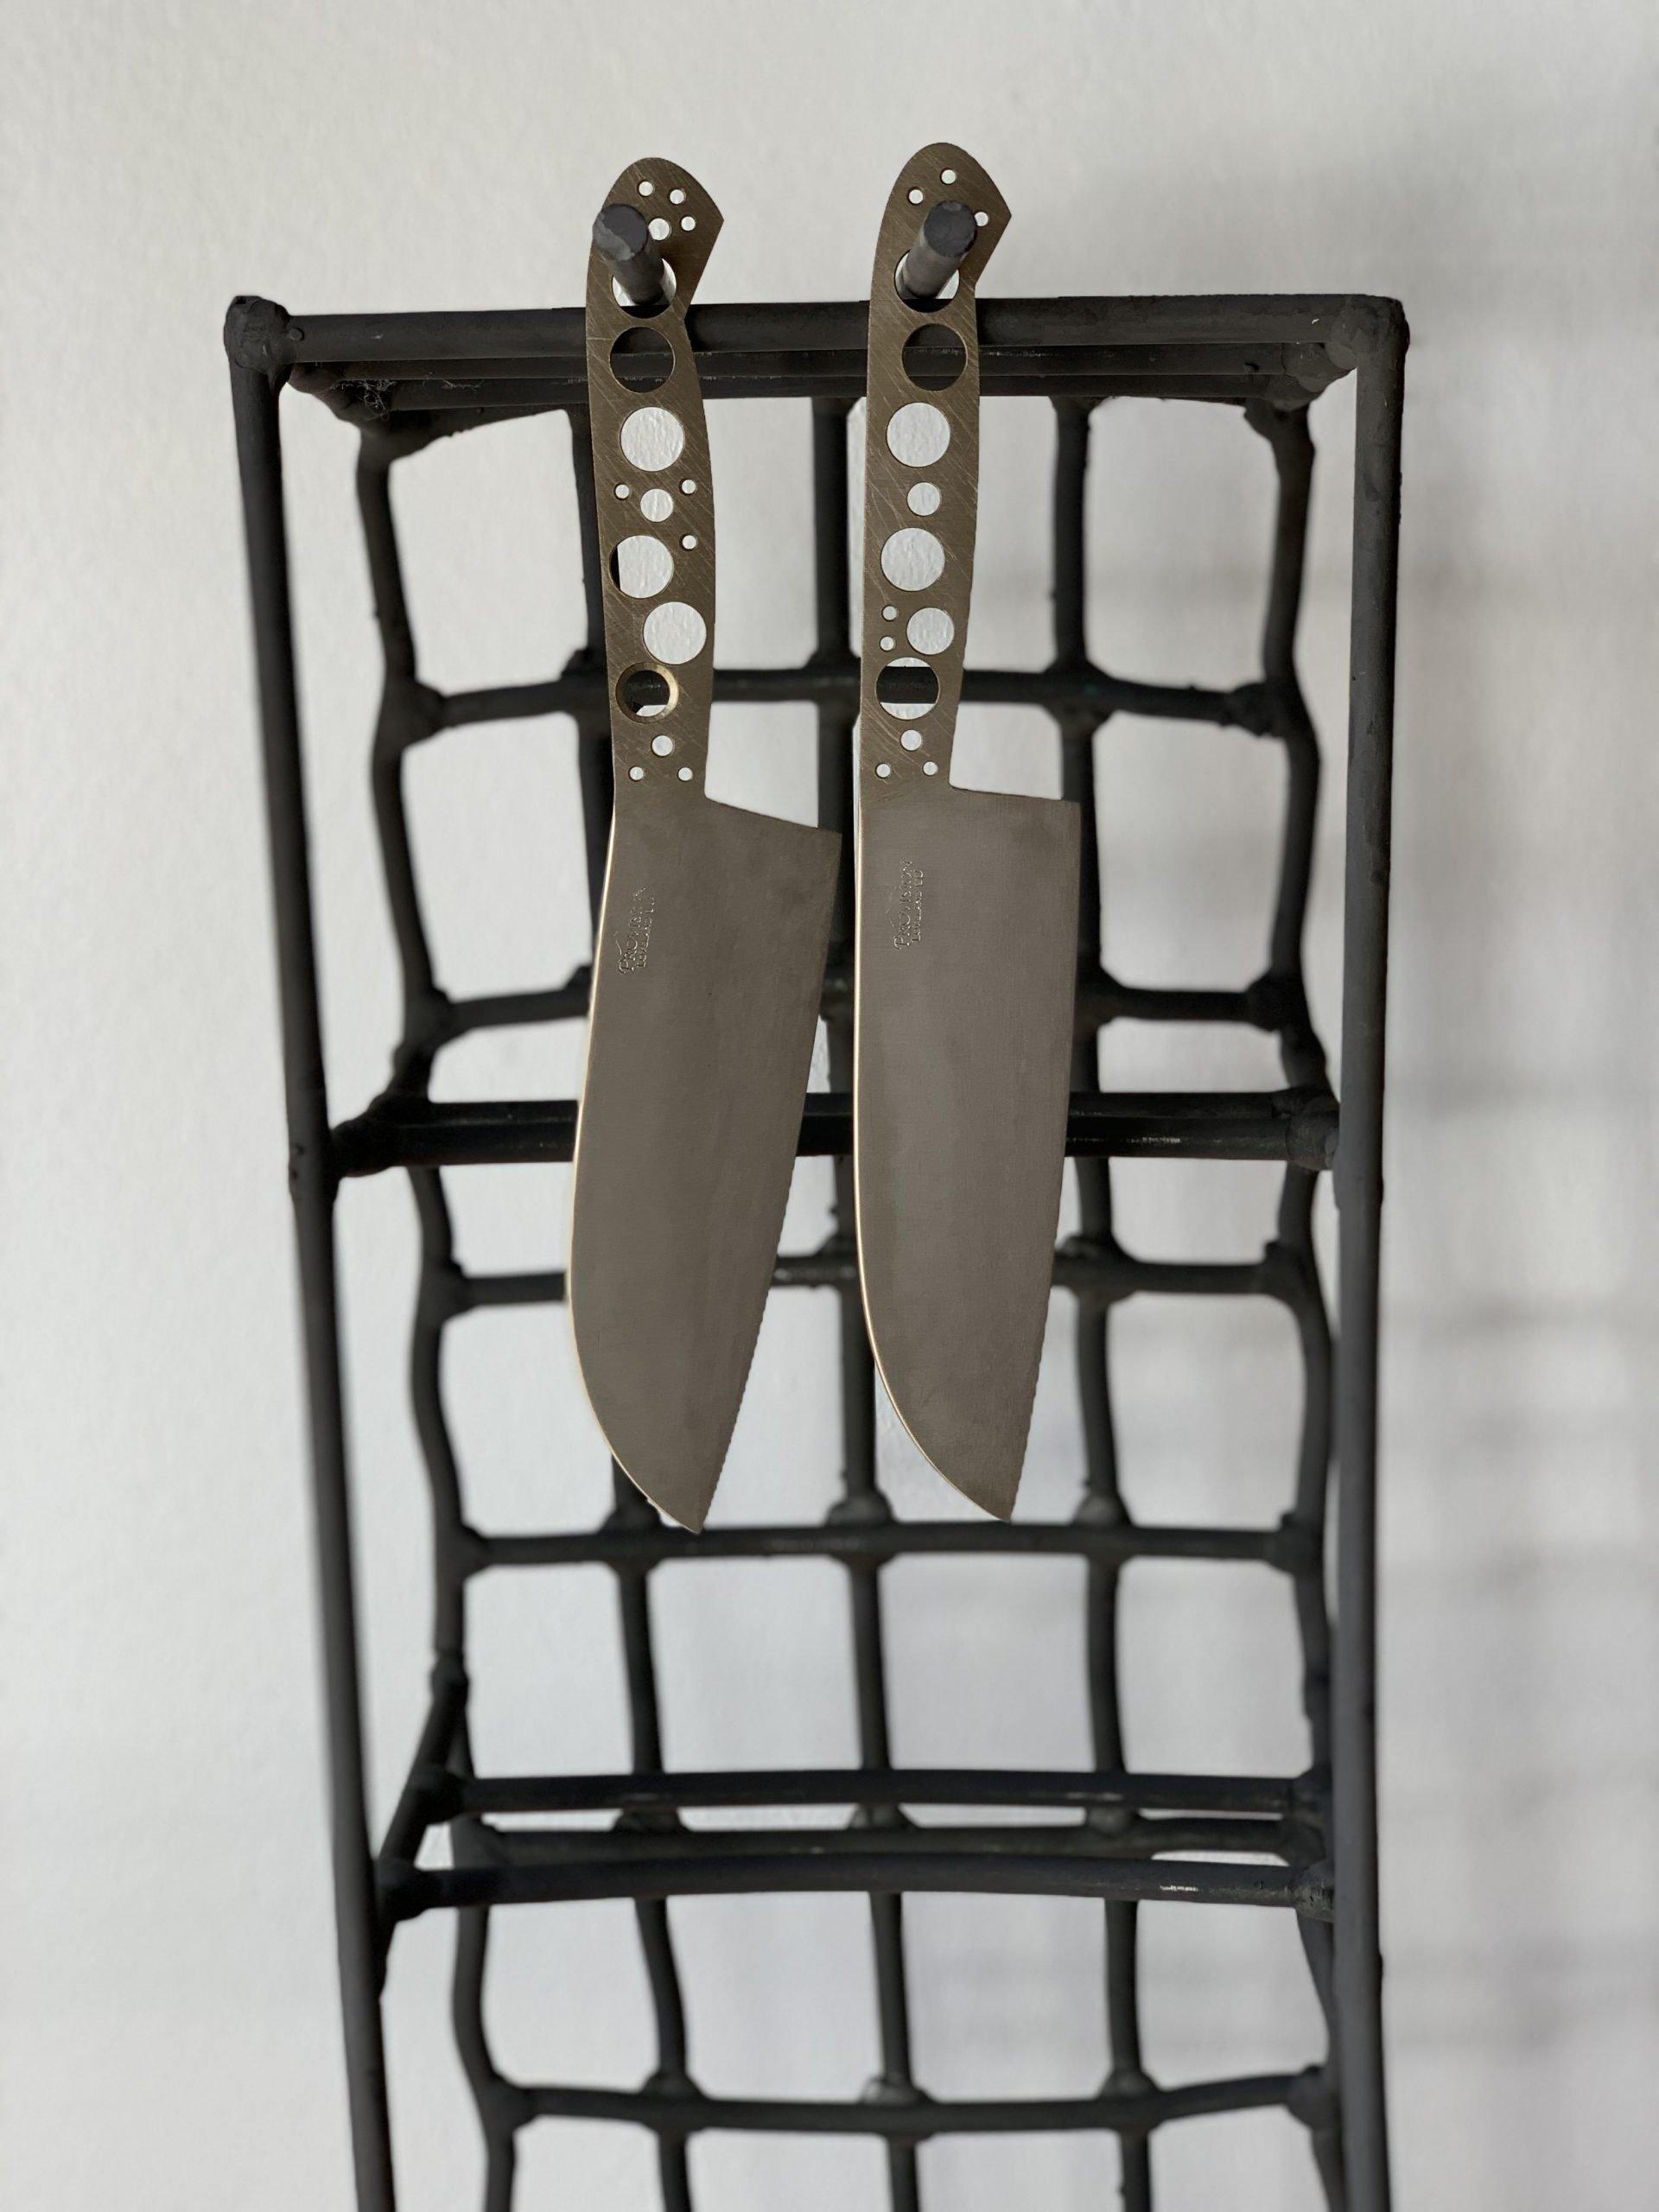 knives hanging